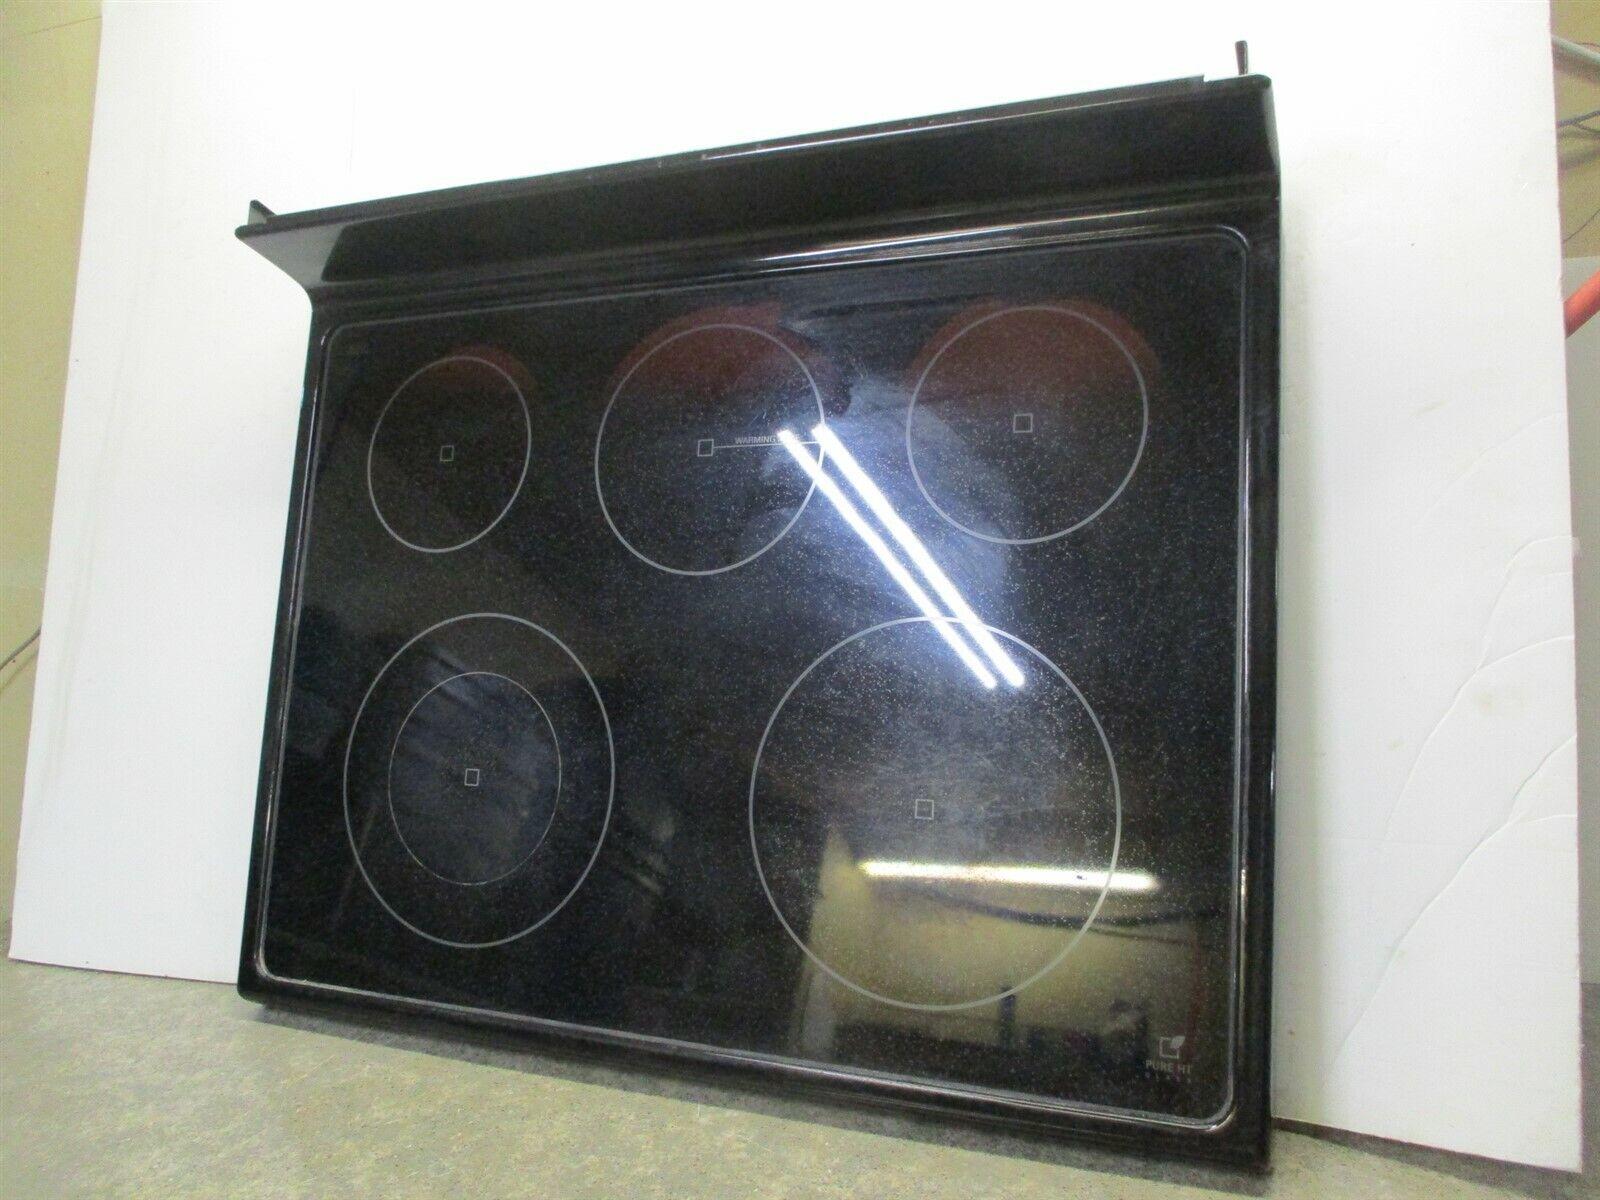 LG RANGE GLASS STOVE TOP PART # AGU73969703